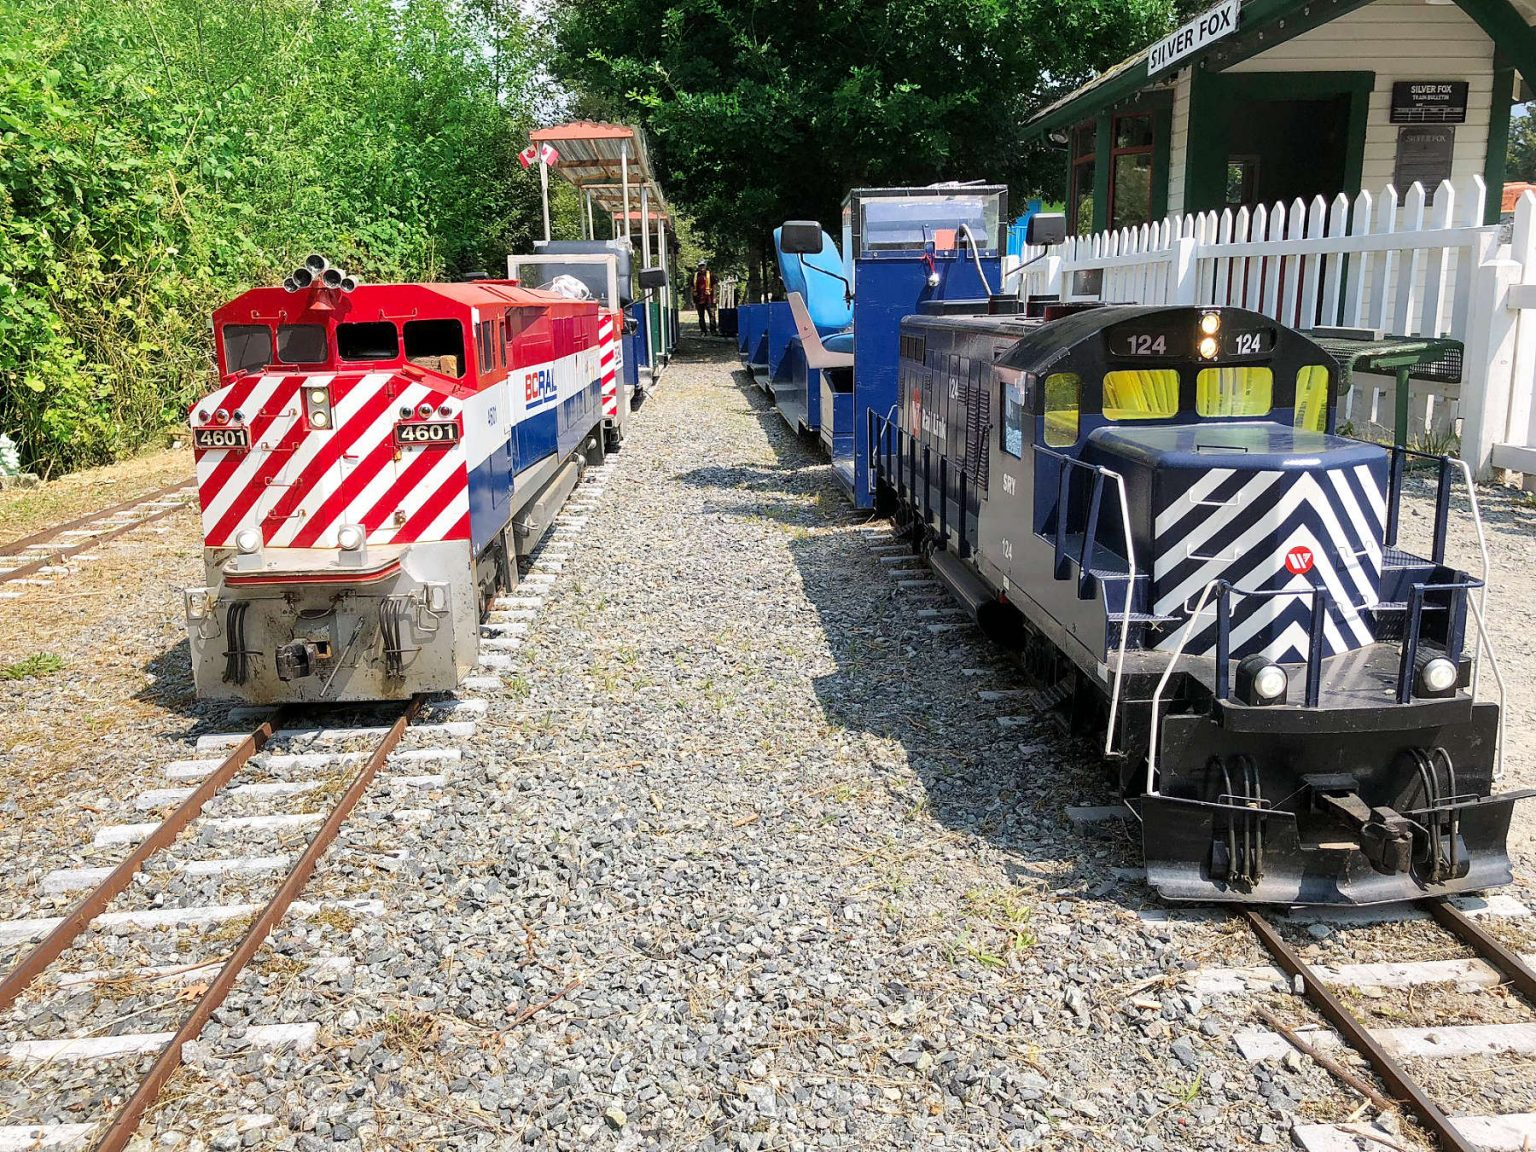 Mini-rail double at Silver Fox